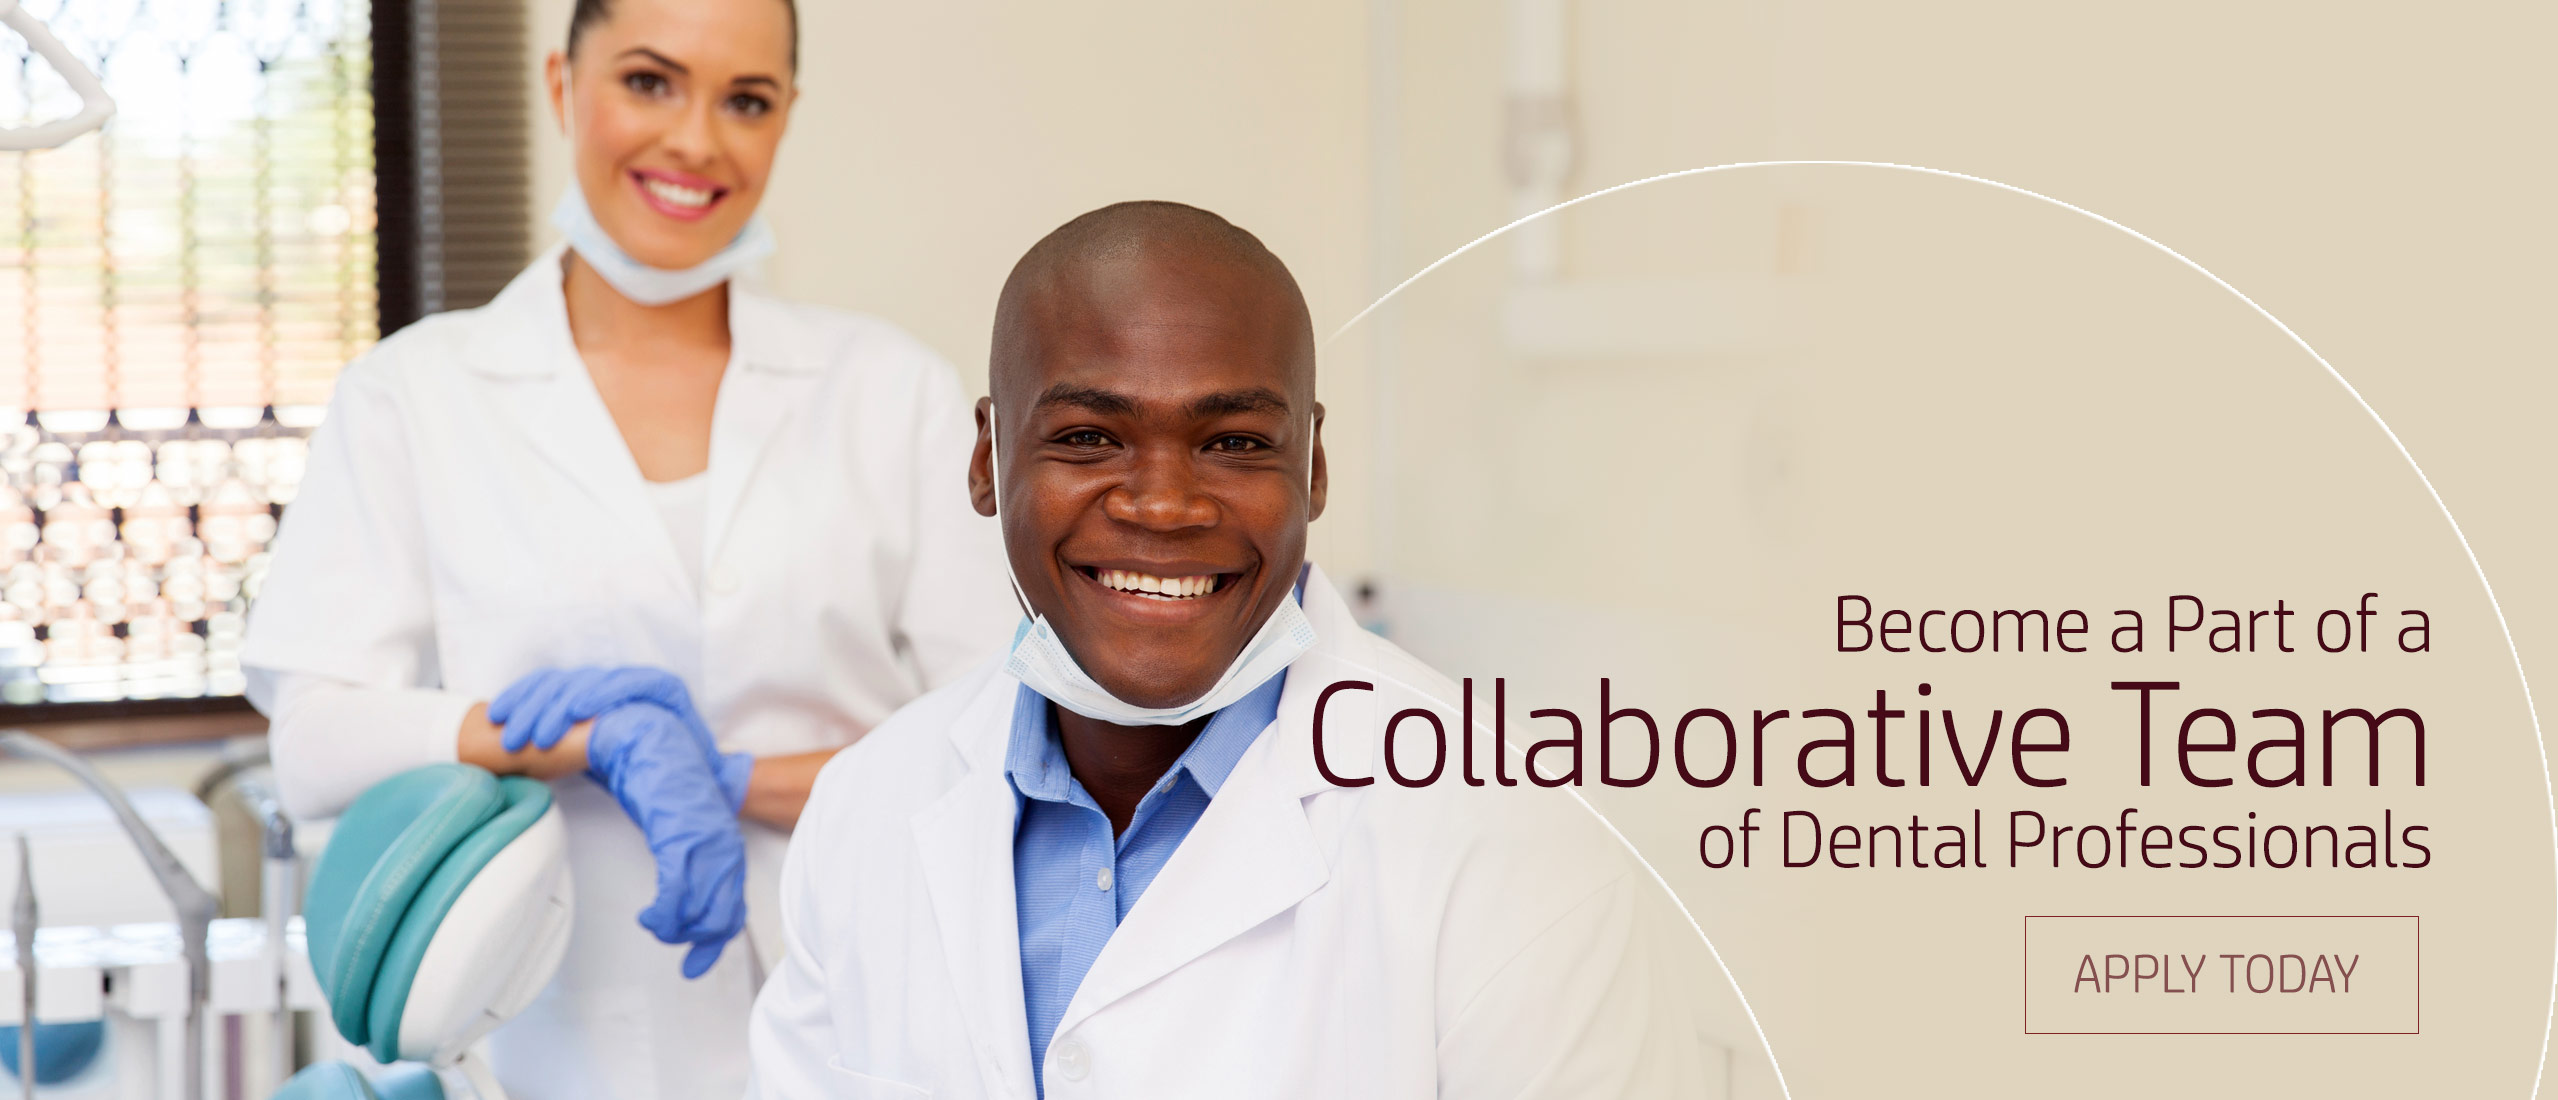 collaborative-team-of-dental-professionals